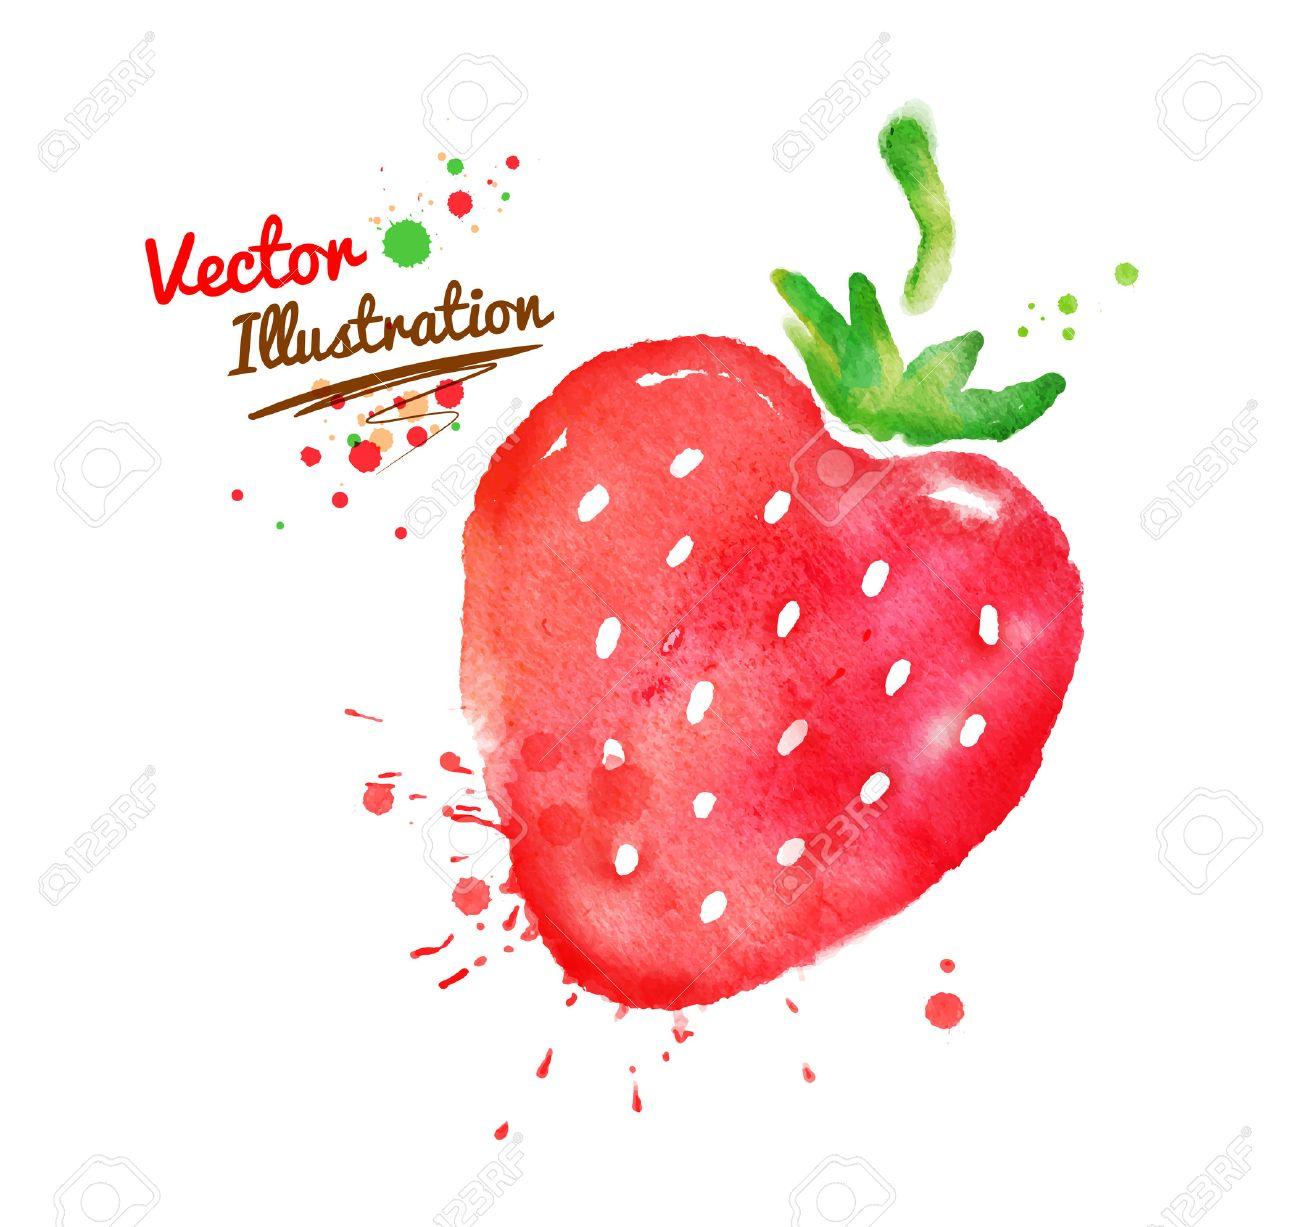 Vector watercolor hand drawn strawberry. - 39809590